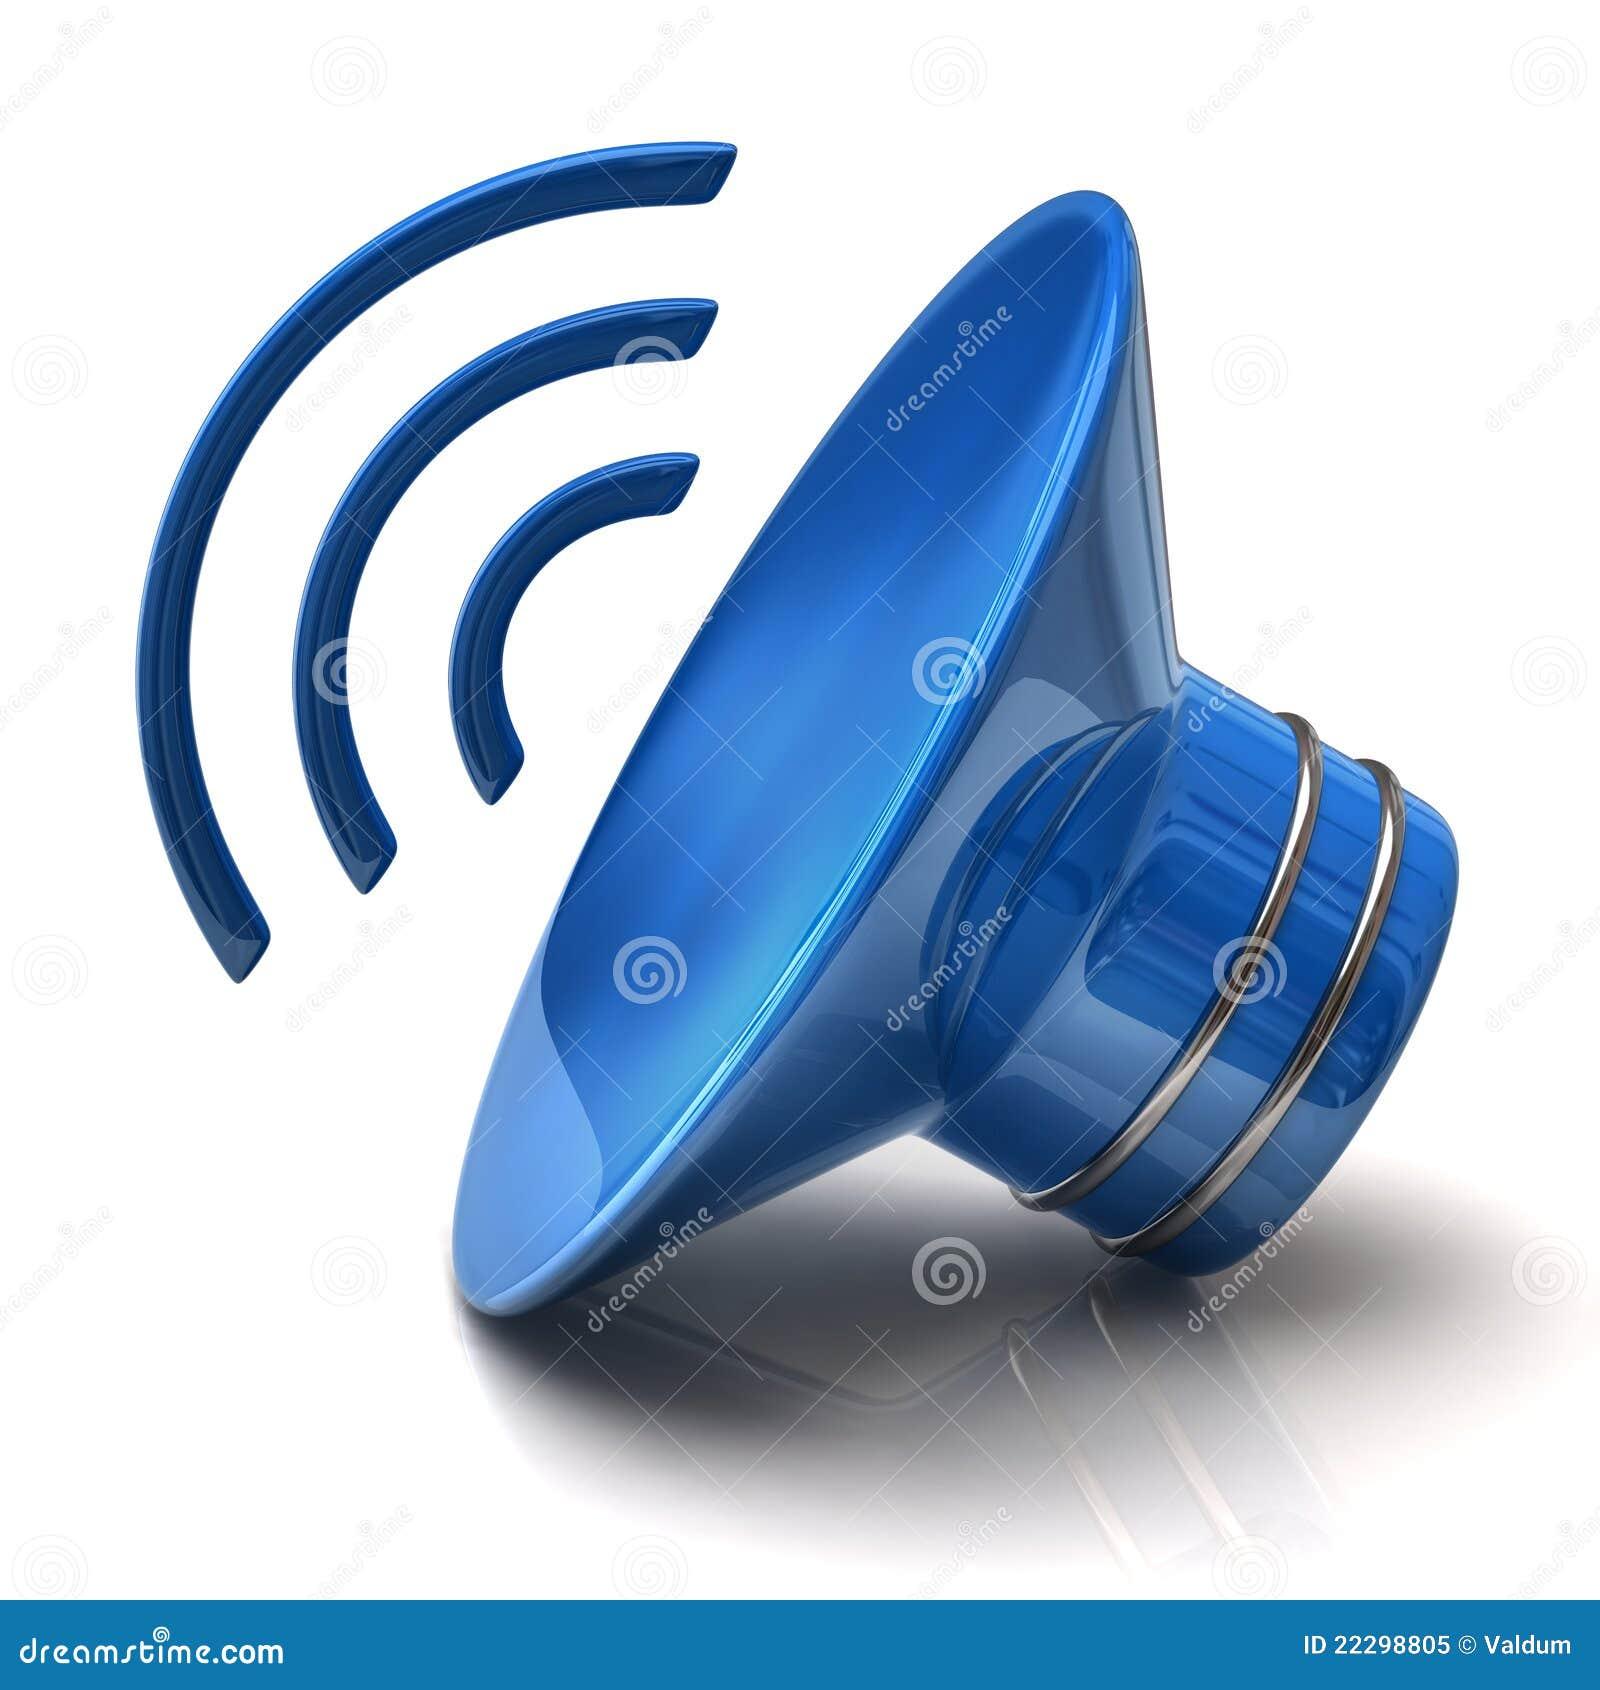 Speaker Icon Royalty Free Stock Photo - Image: 22298805